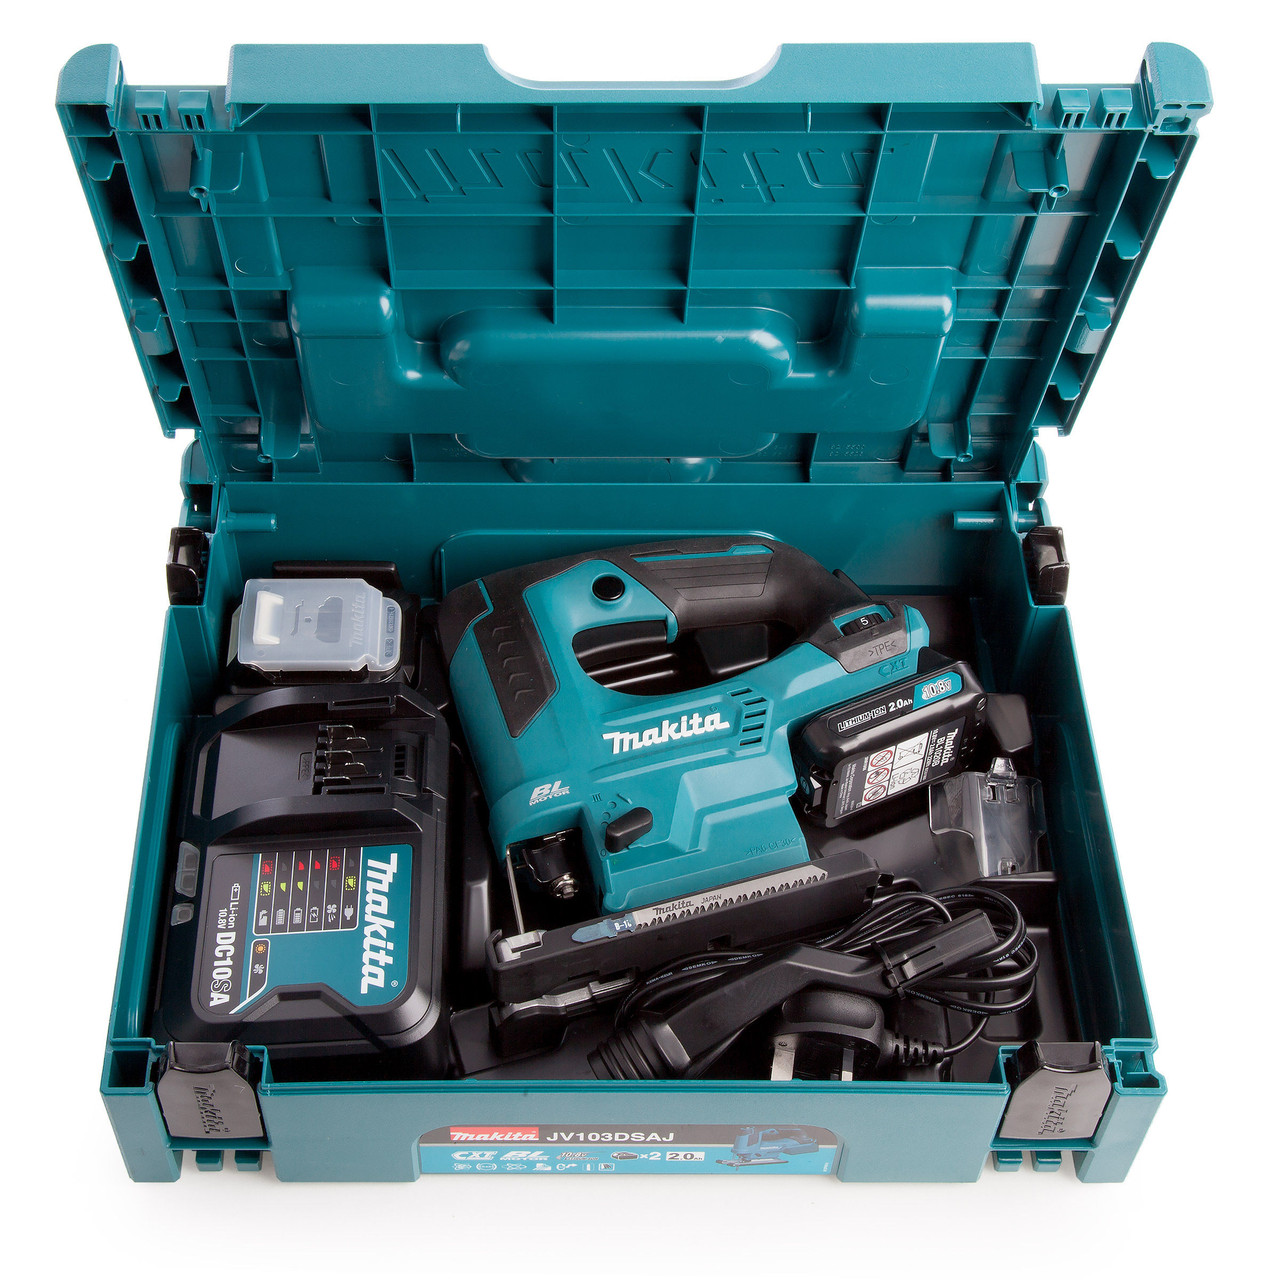 Makita JV103DSAJ 10.8V Li-ion CXT Brushless Jigsaw 2 x 2.0Ah Batteries in MakPac Case